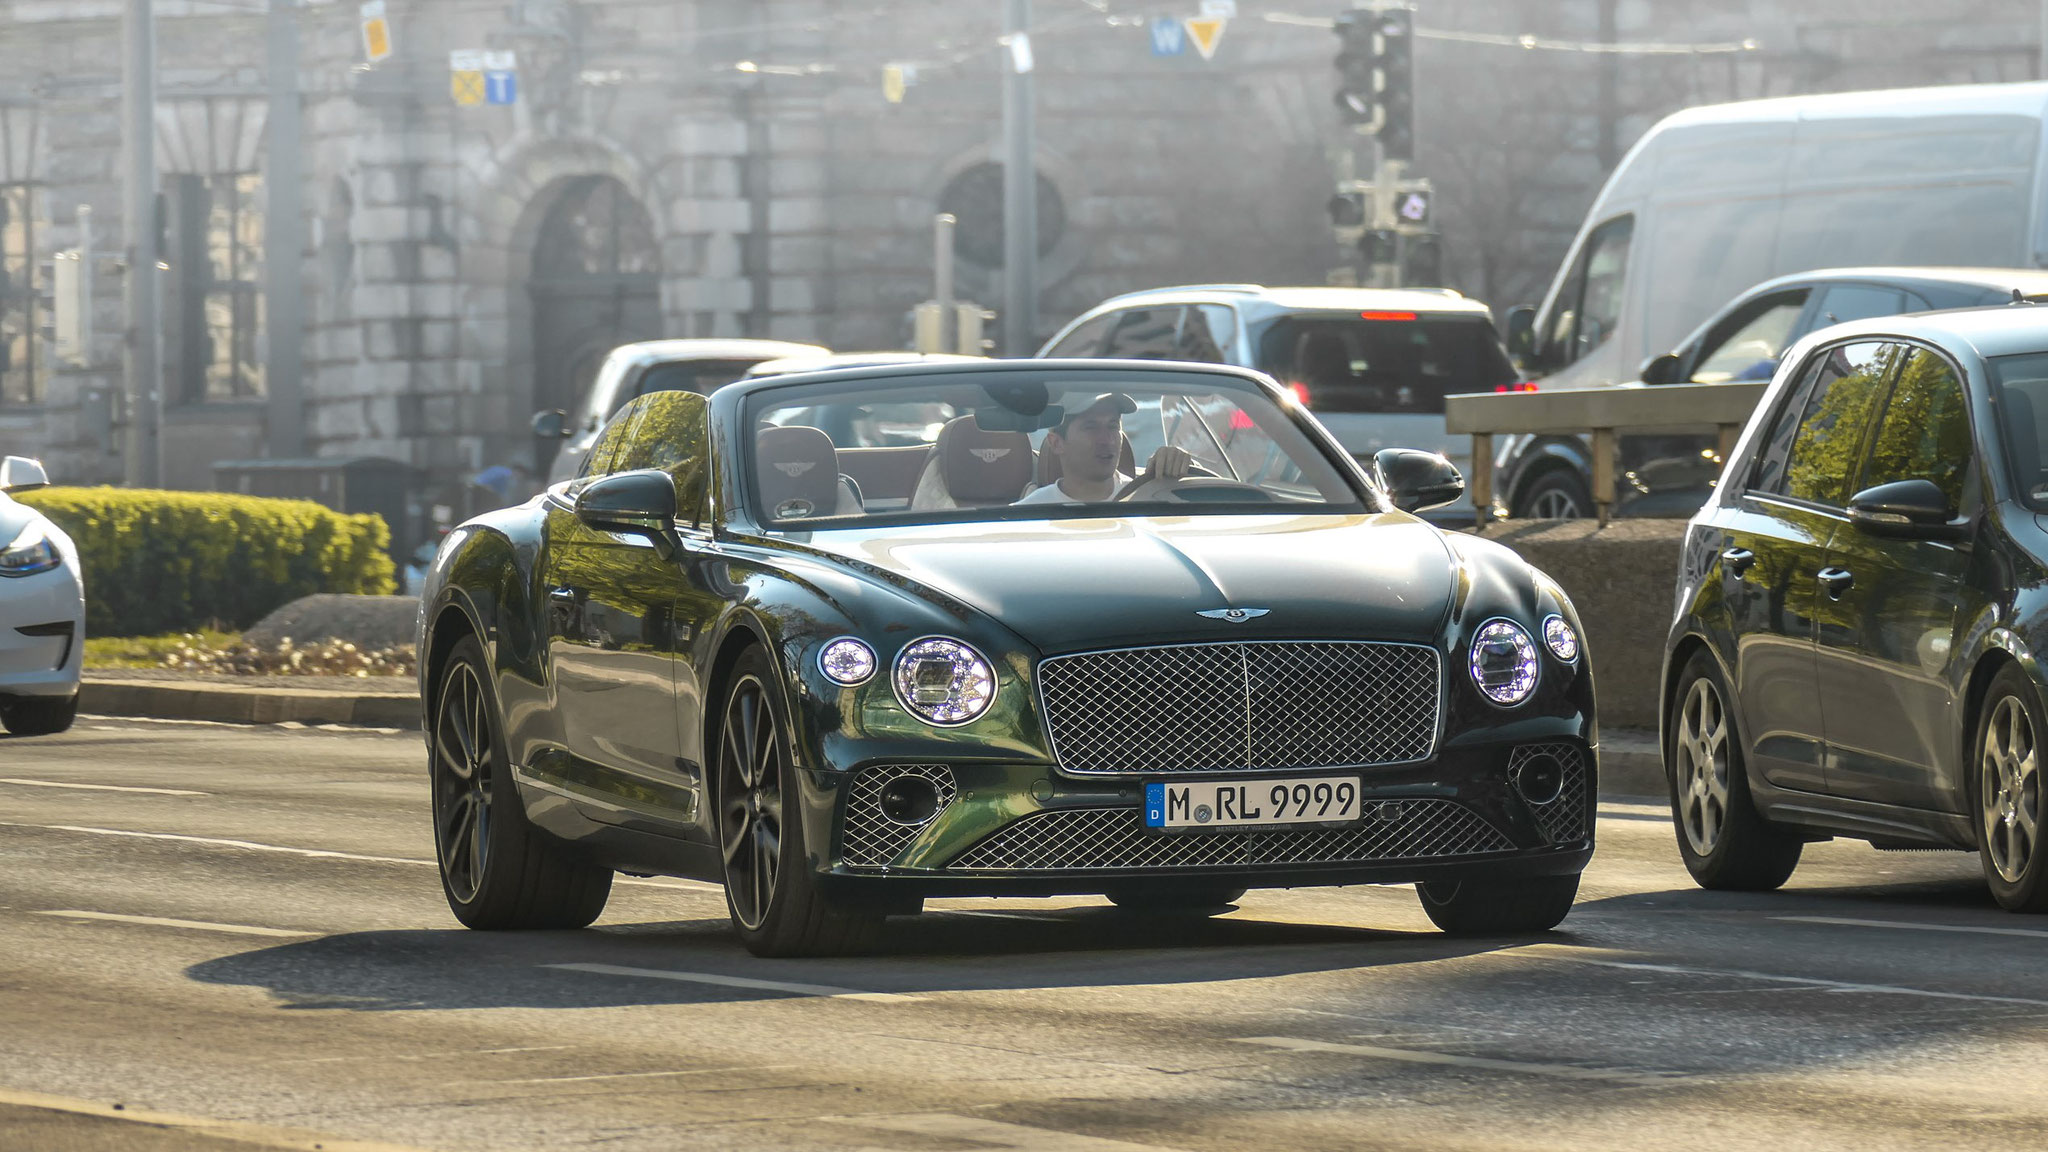 Bentley Continental GTC - M-RL-9999